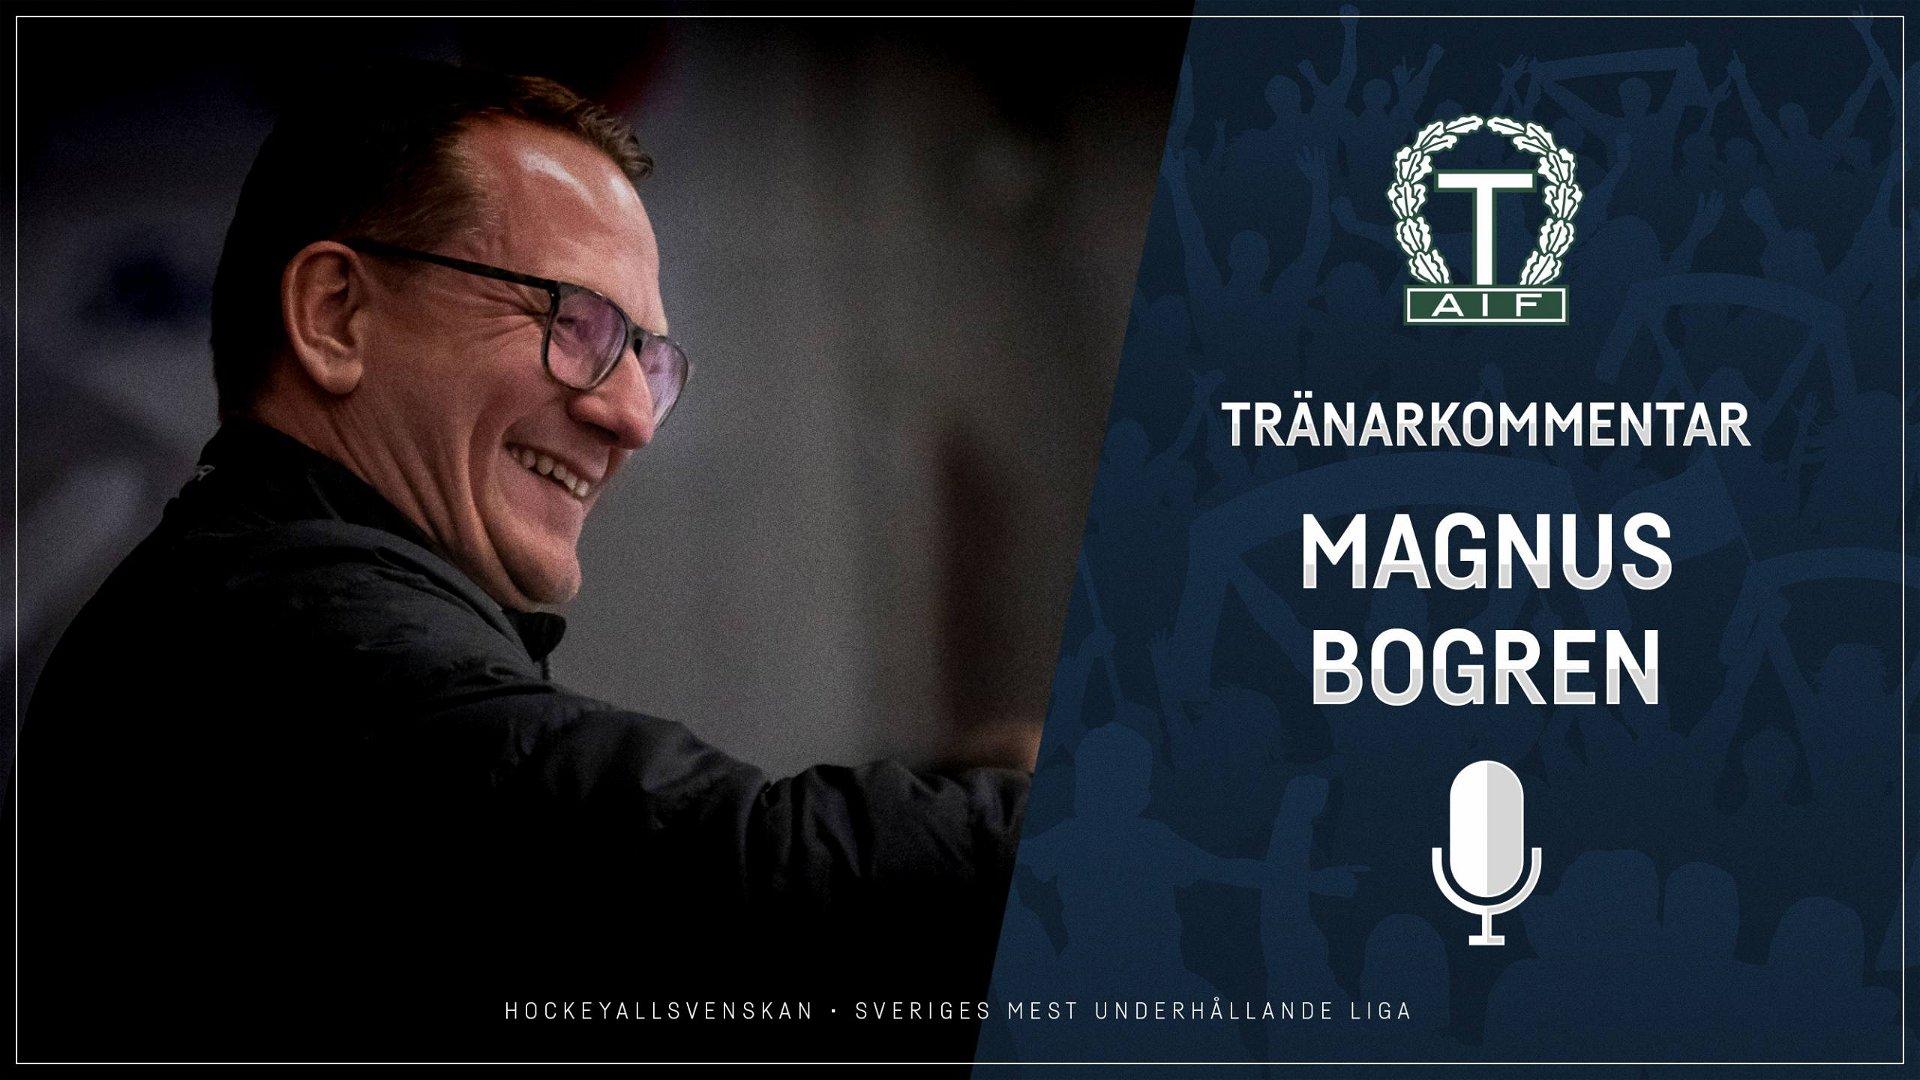 2020-11-25 Segerintervju: Magnus Bogren